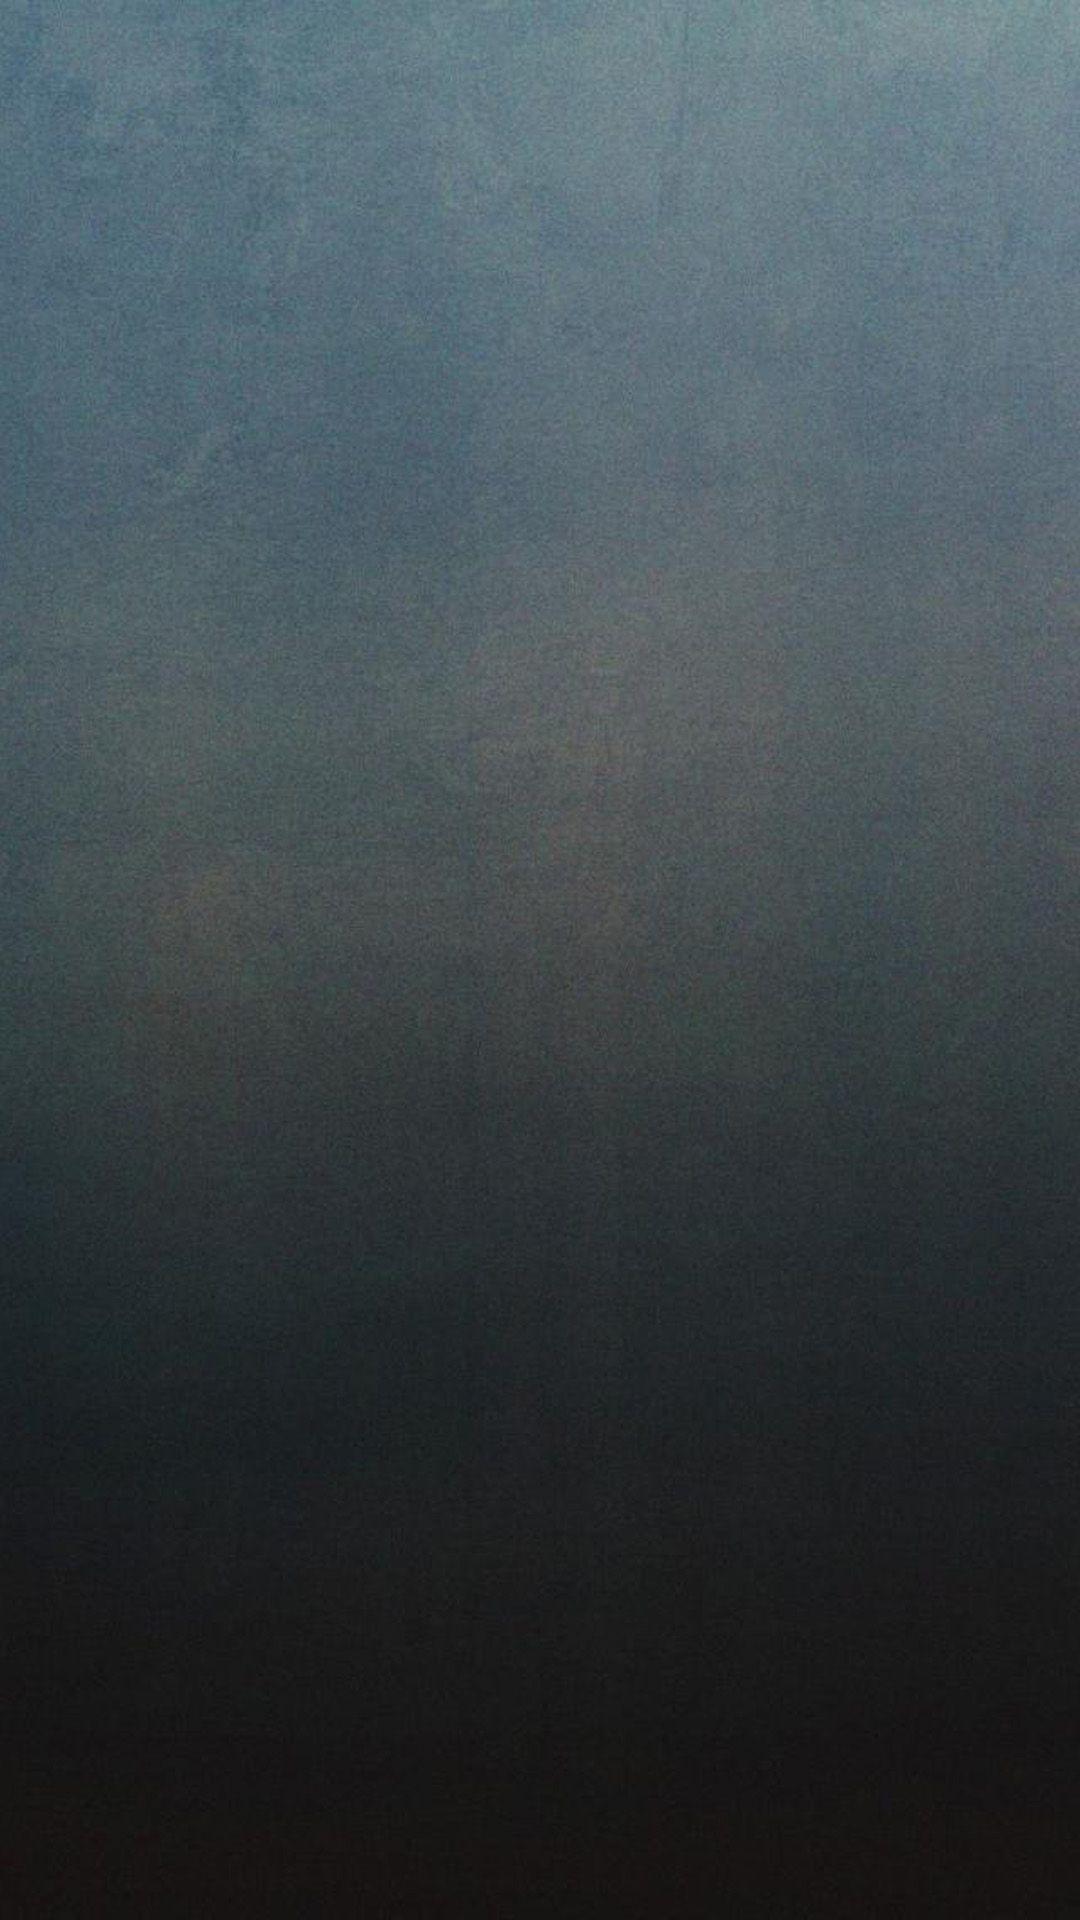 Grunge Wallpaper iPhone 5